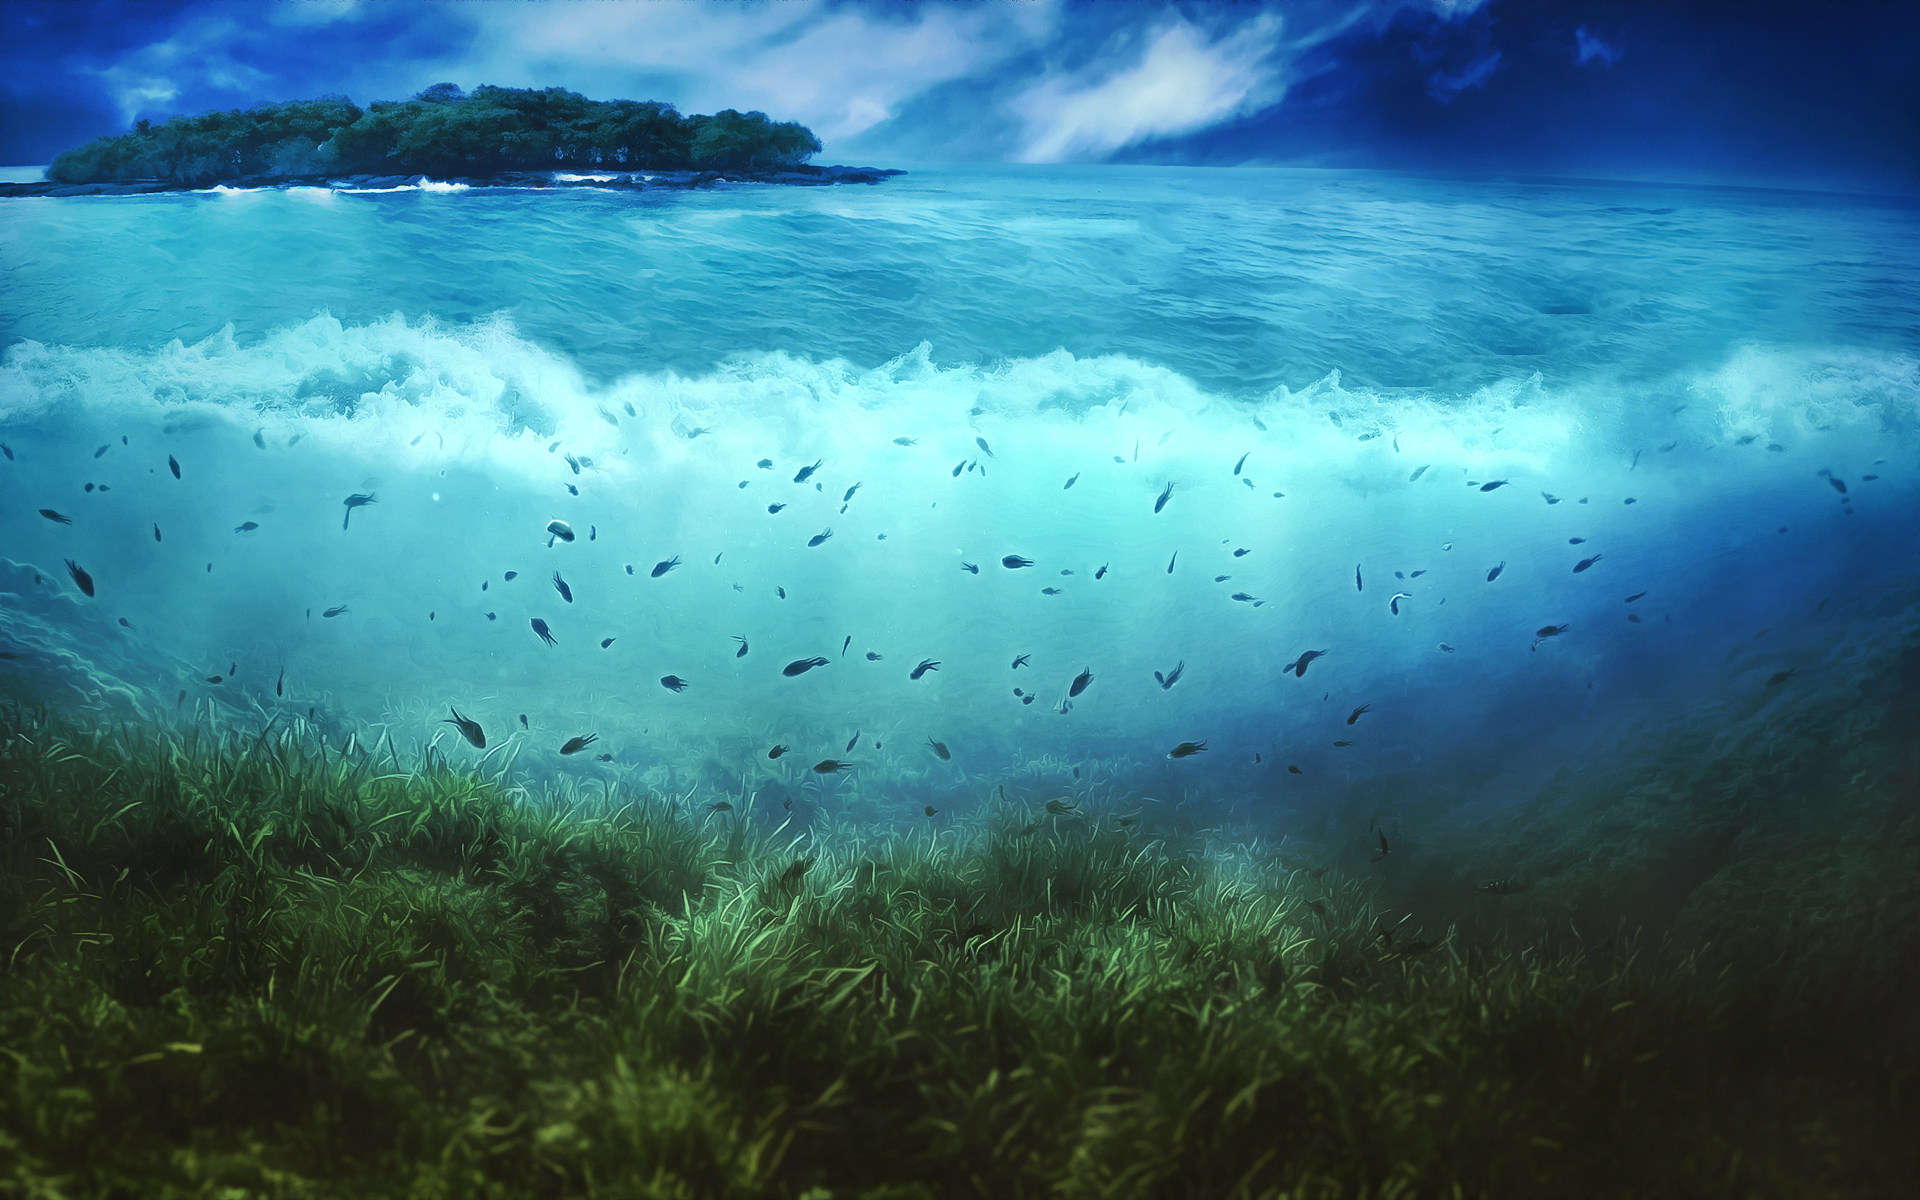 World Of Sea Wallpaper Sea Hd 132301 Hd Wallpaper